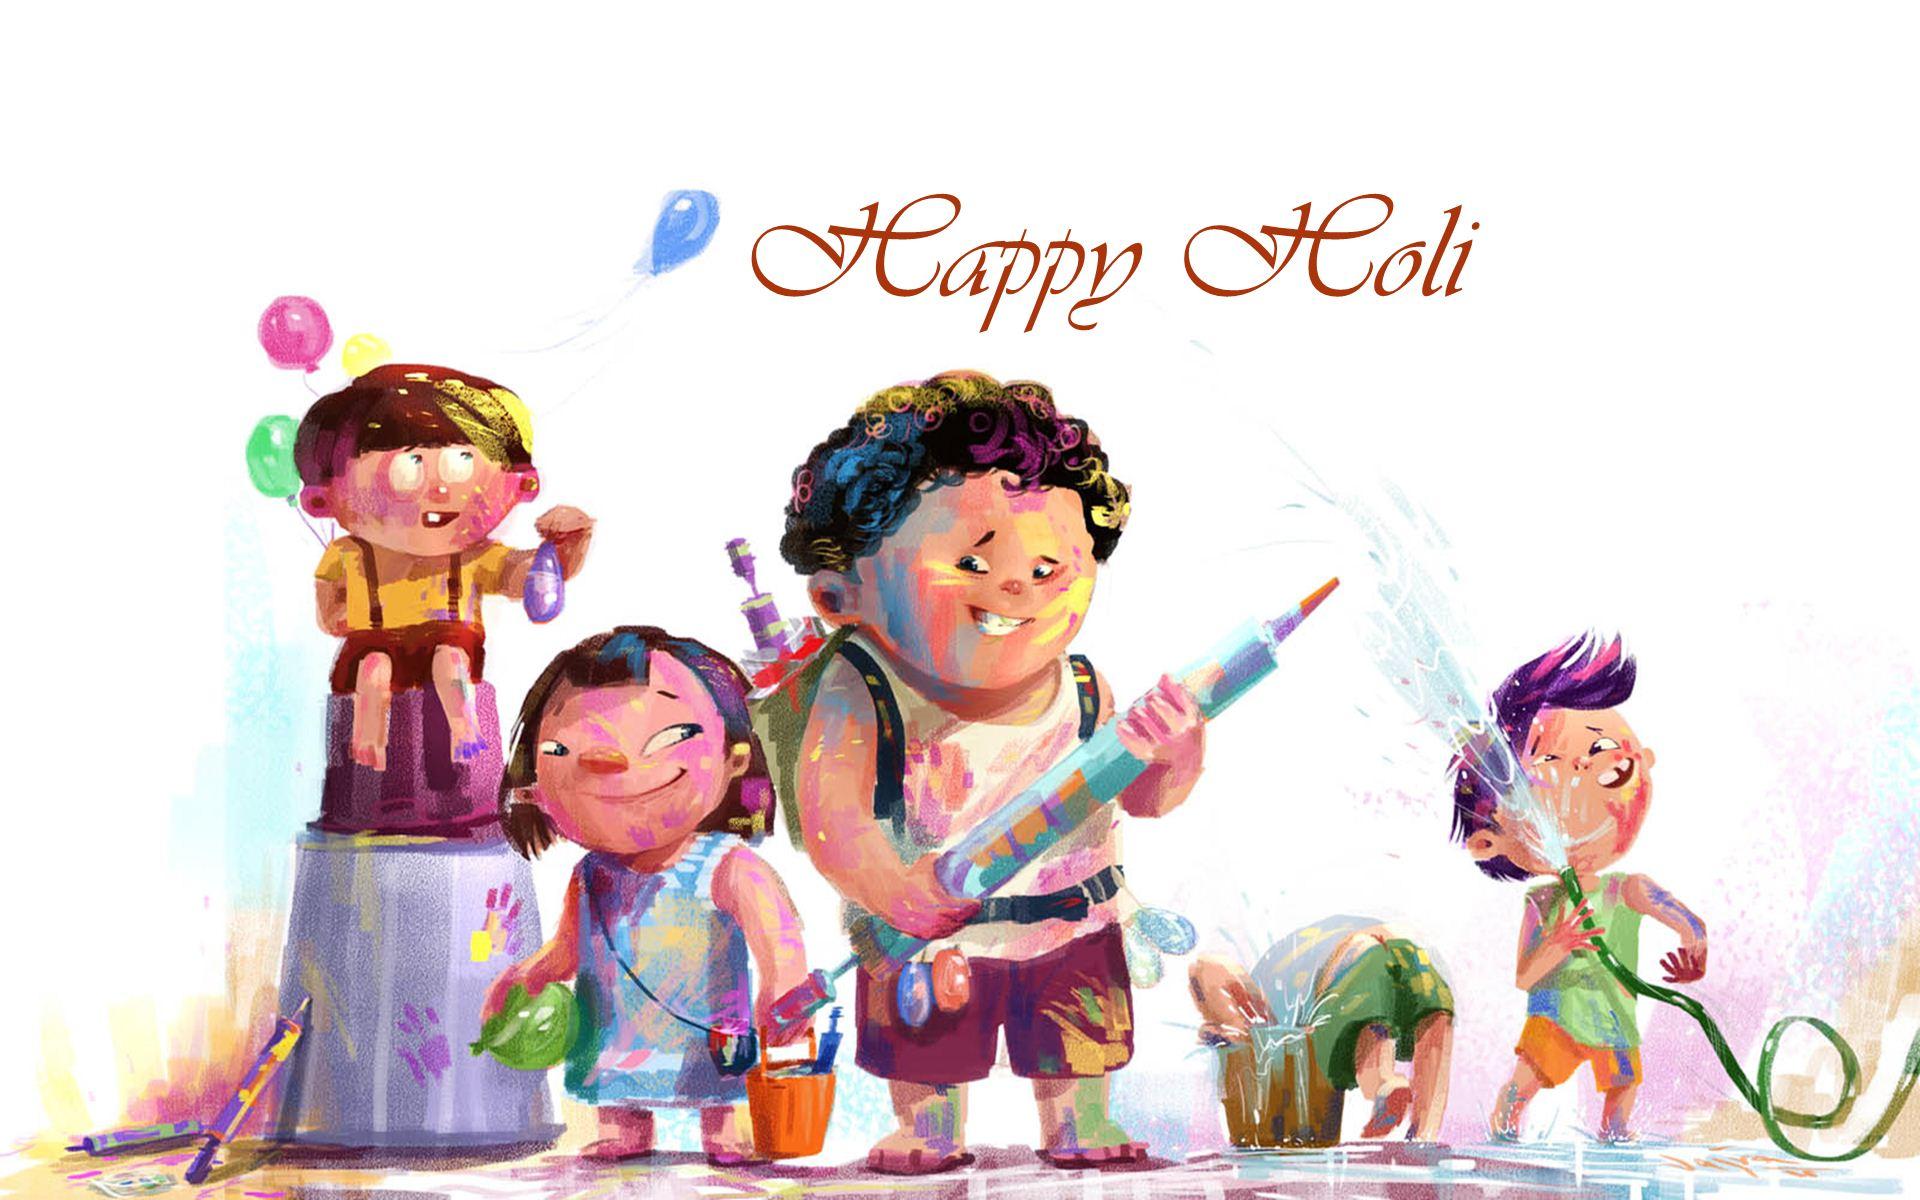 Animated happy holi festival images m4hsunfo